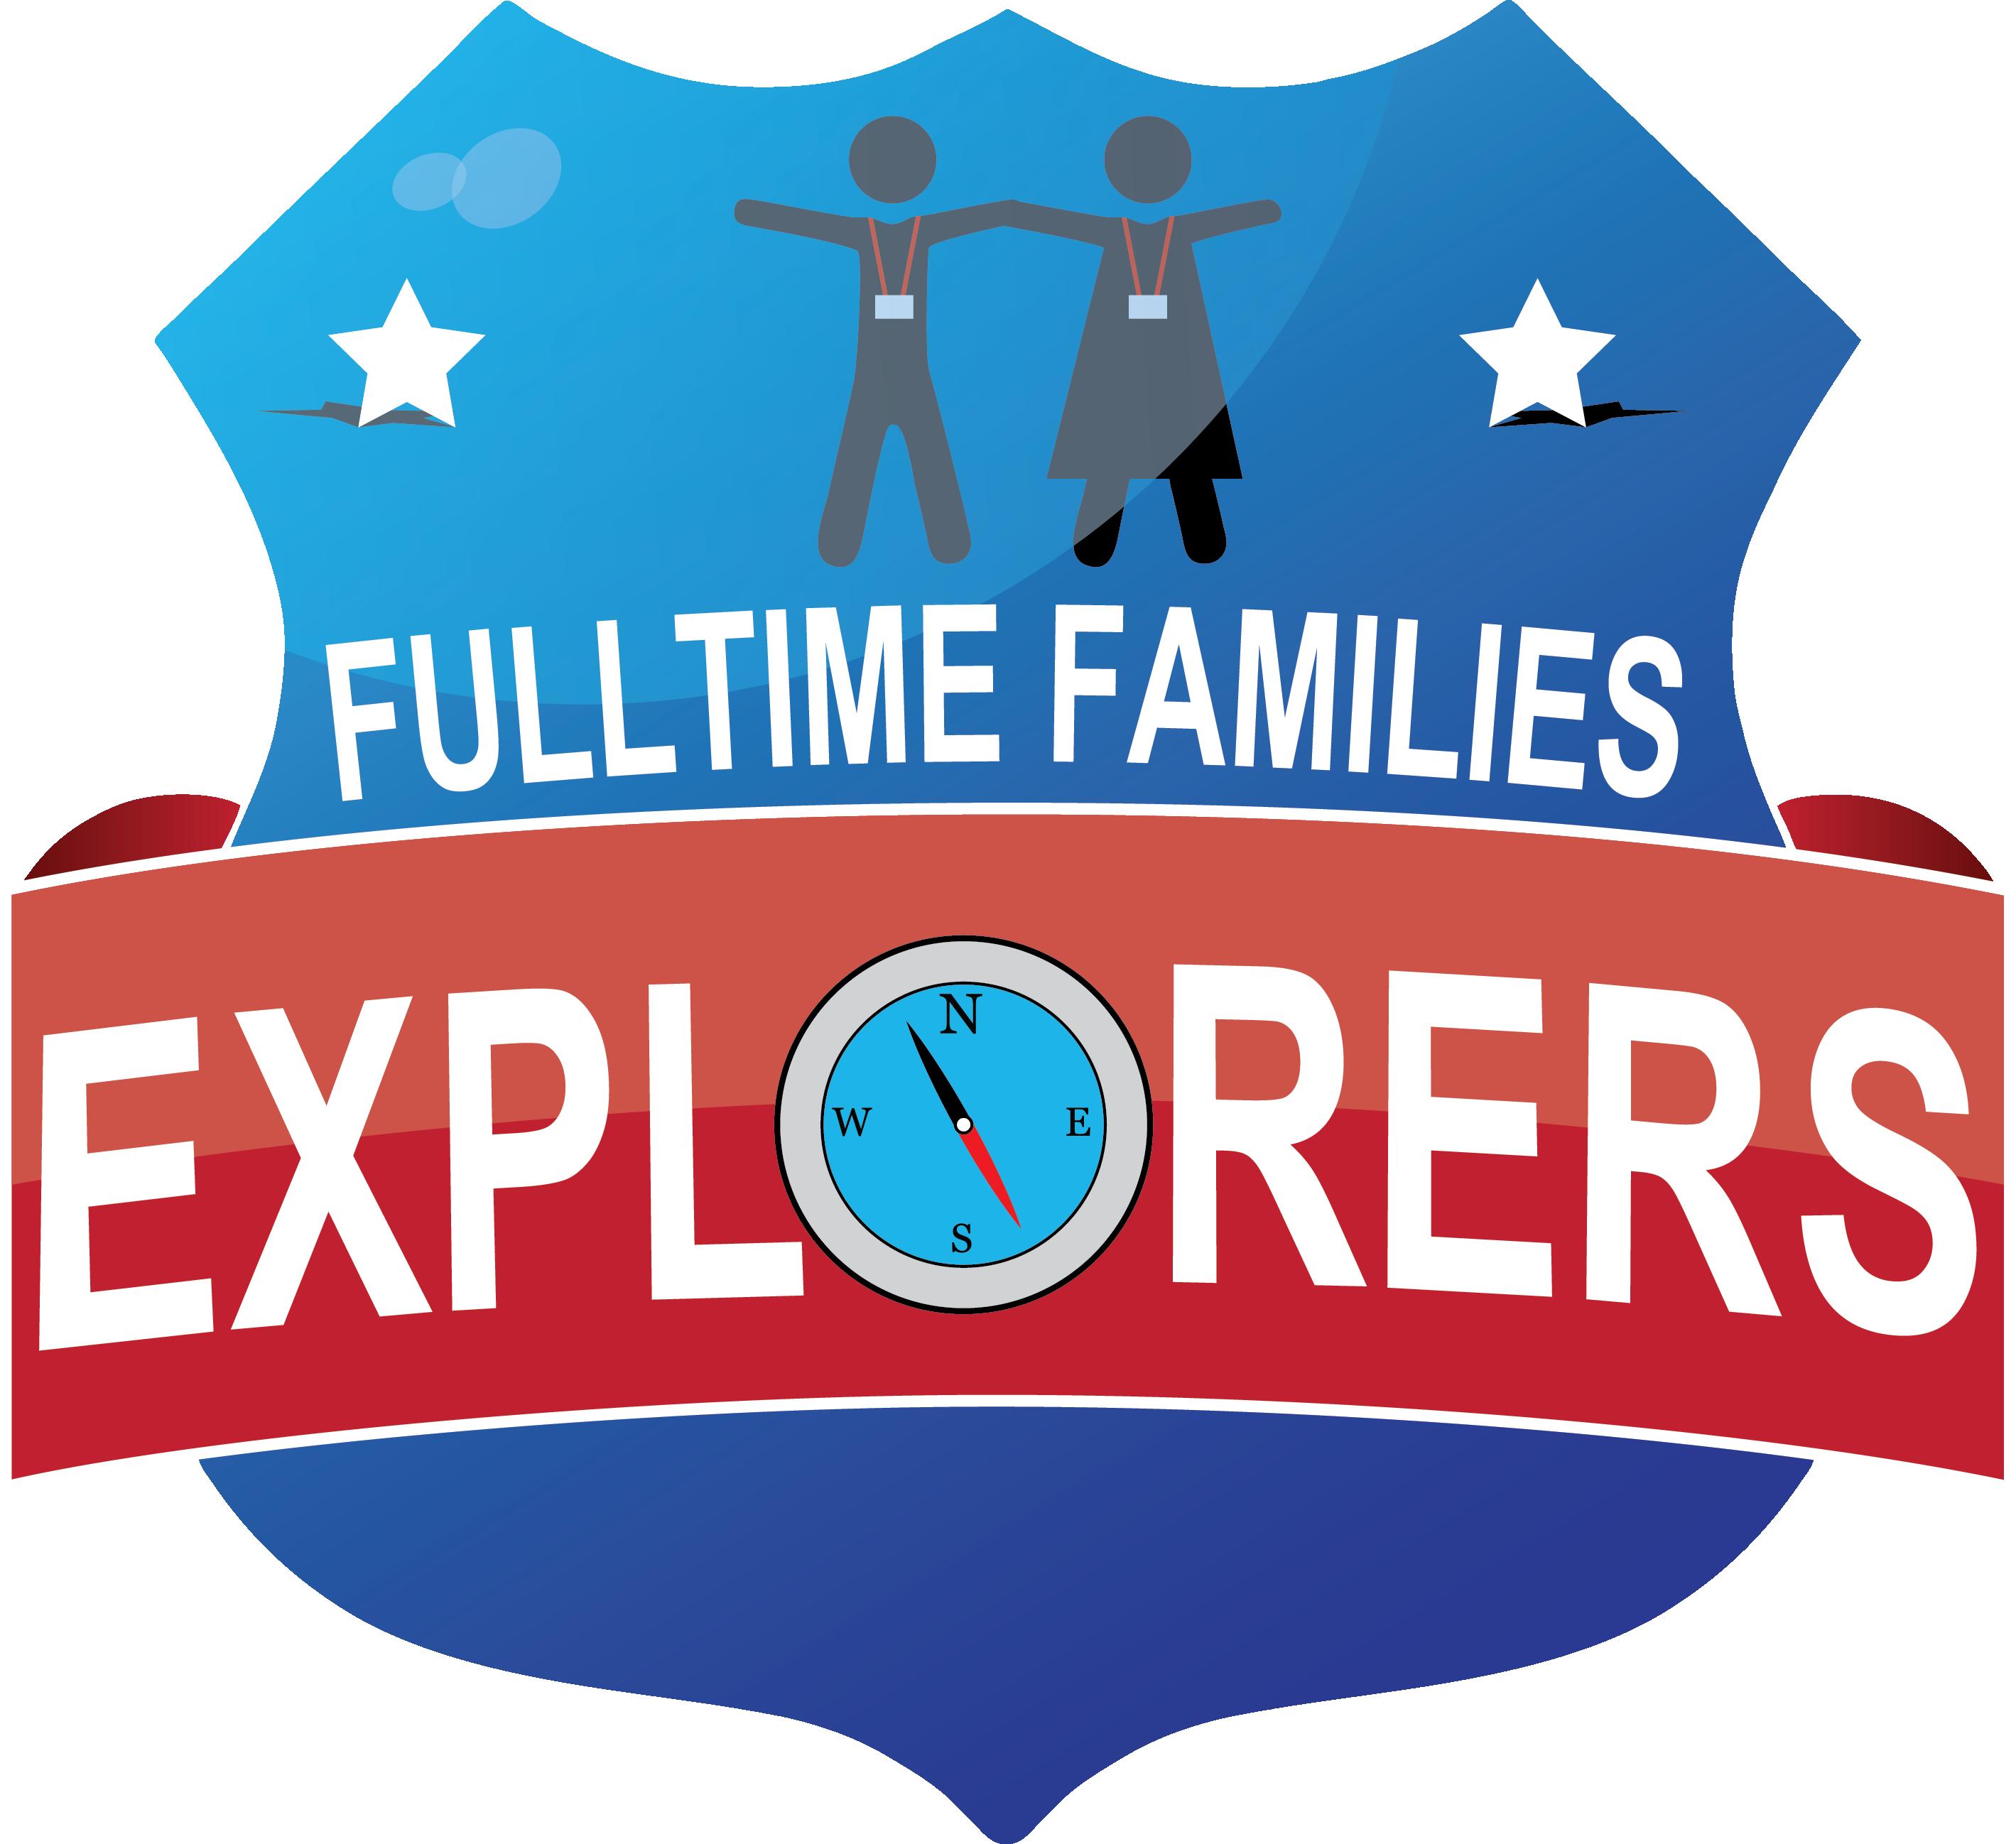 Planner clipart handbook. Fulltime families announces brand